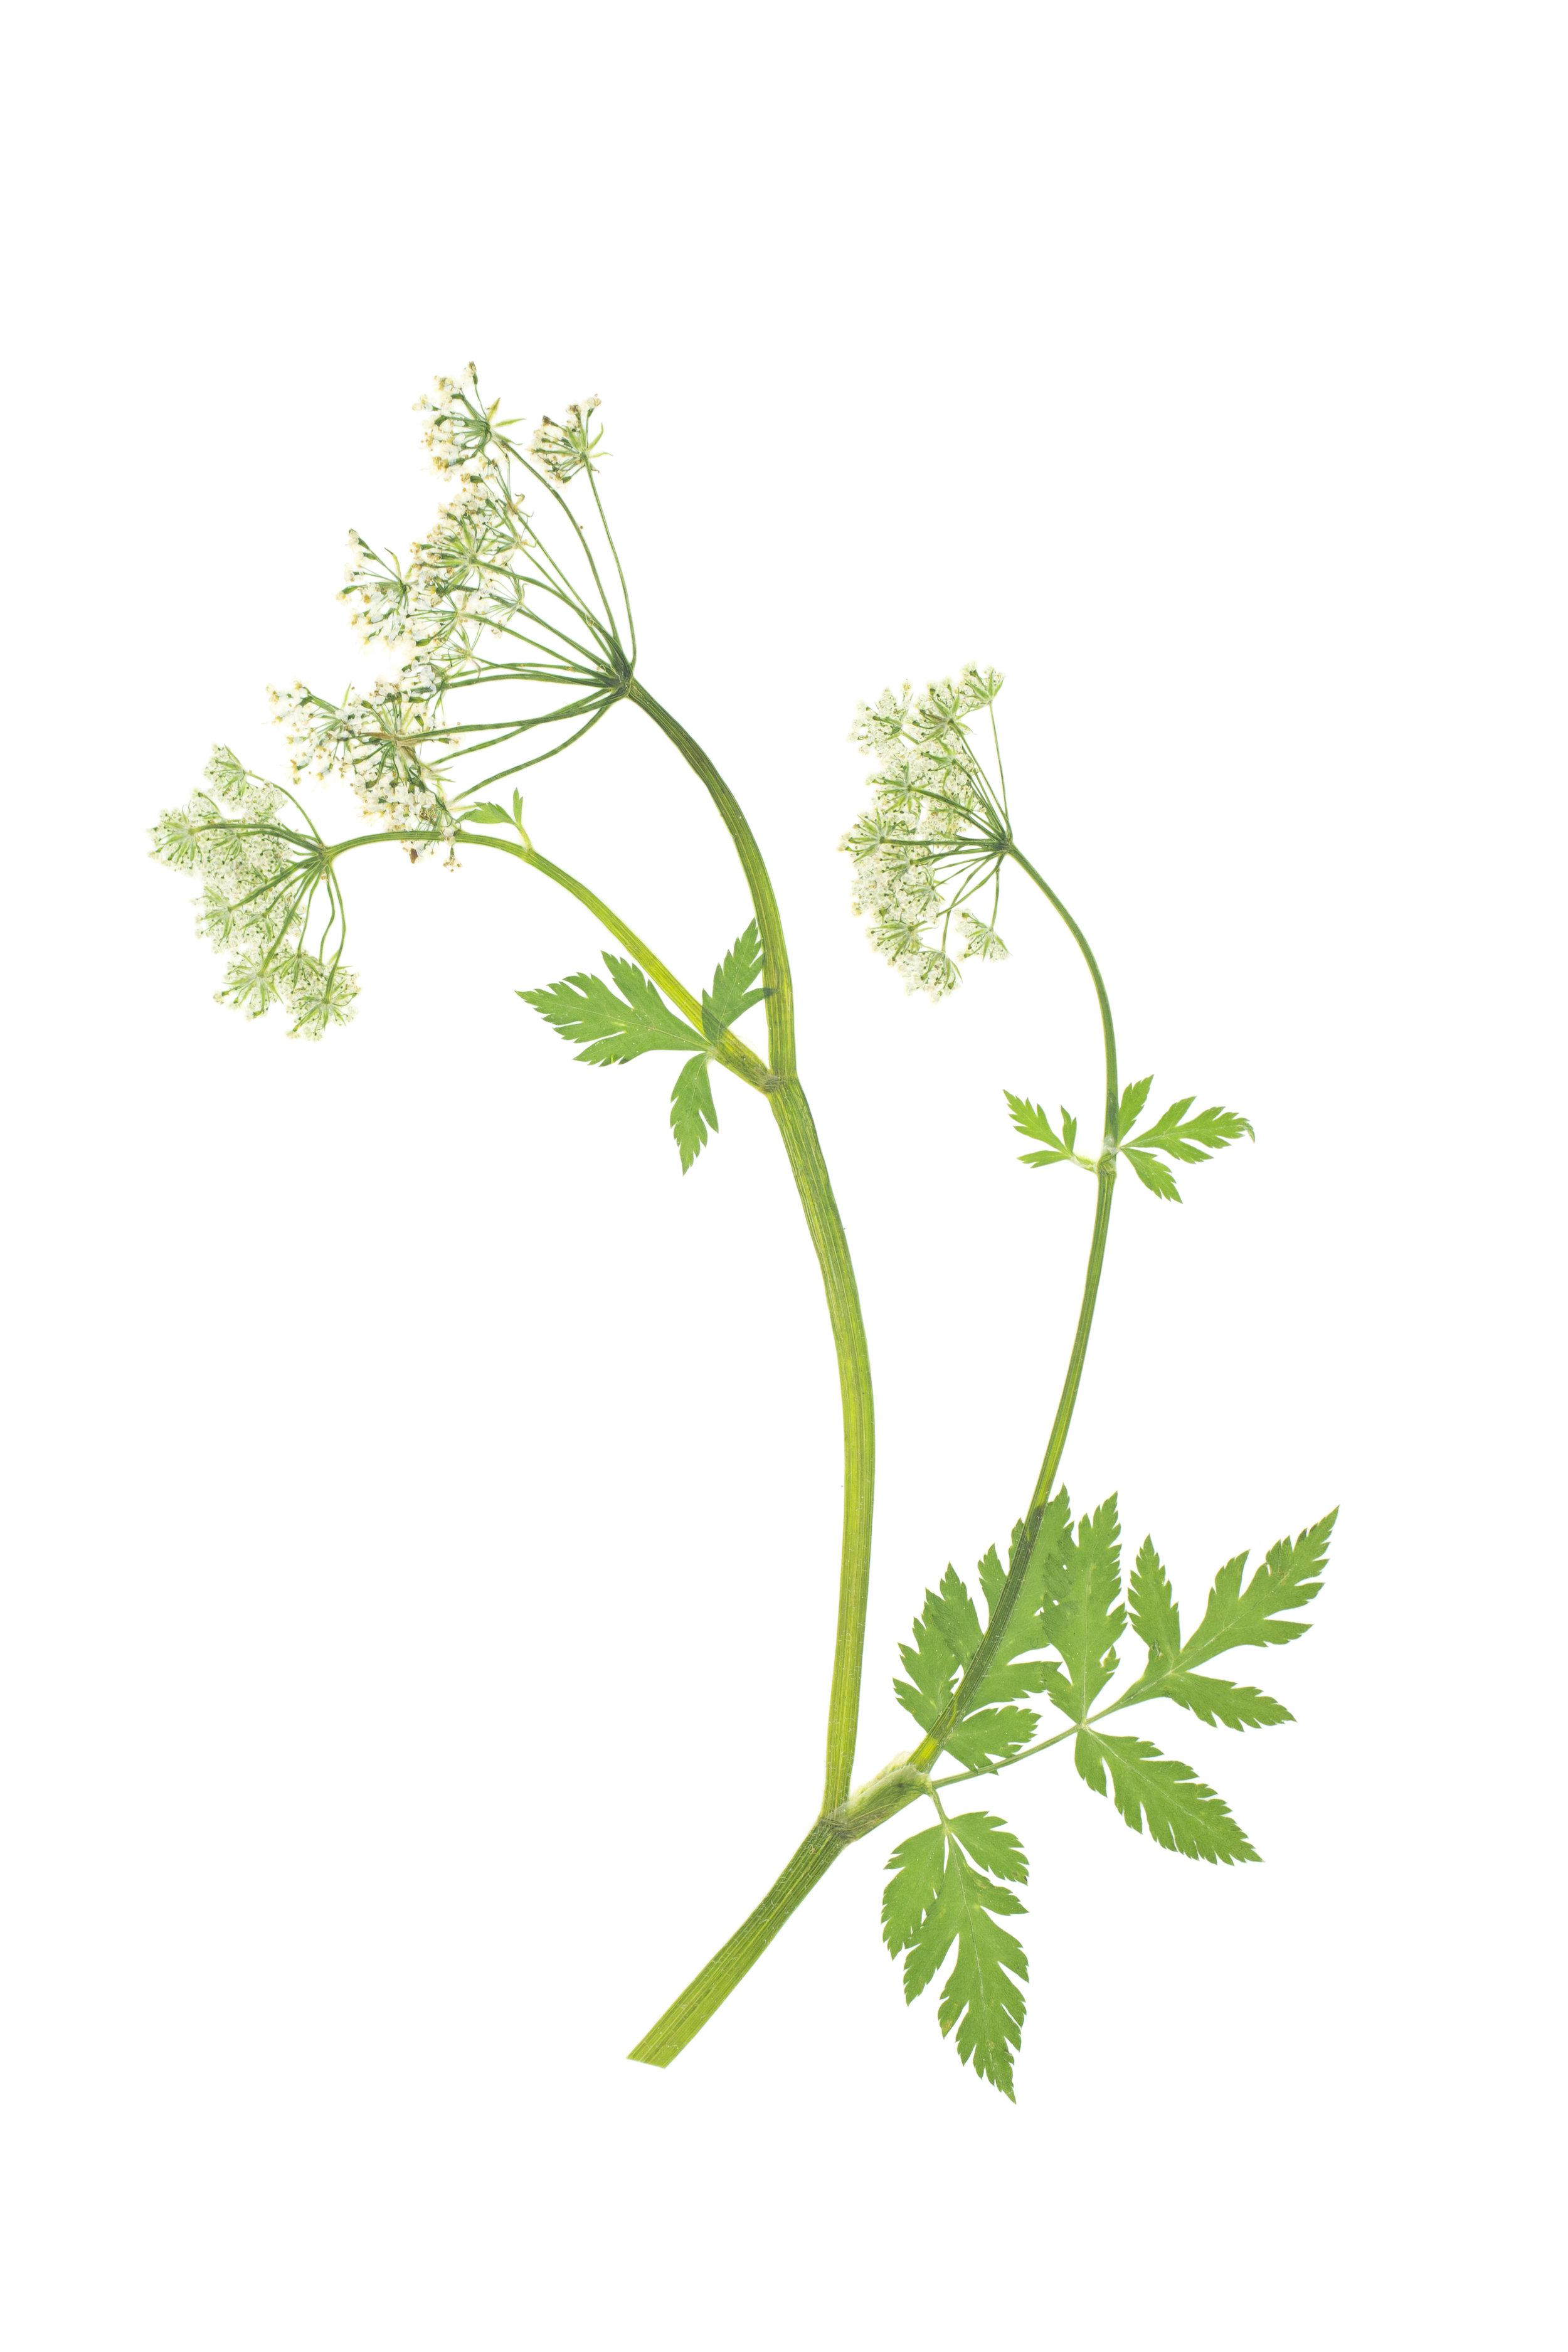 Glossy Chervil / Anthriscus nitida